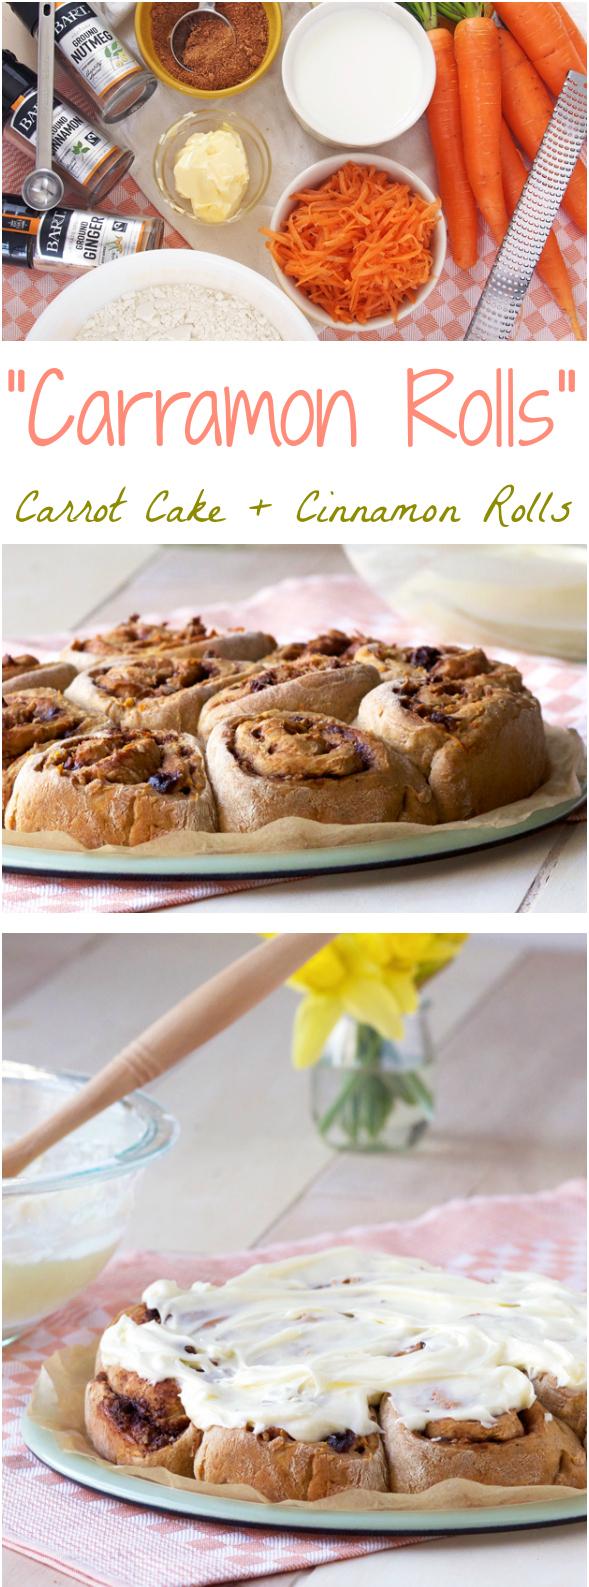 """Carramon Rolls"" = carrot cake + cinnamon rolls"